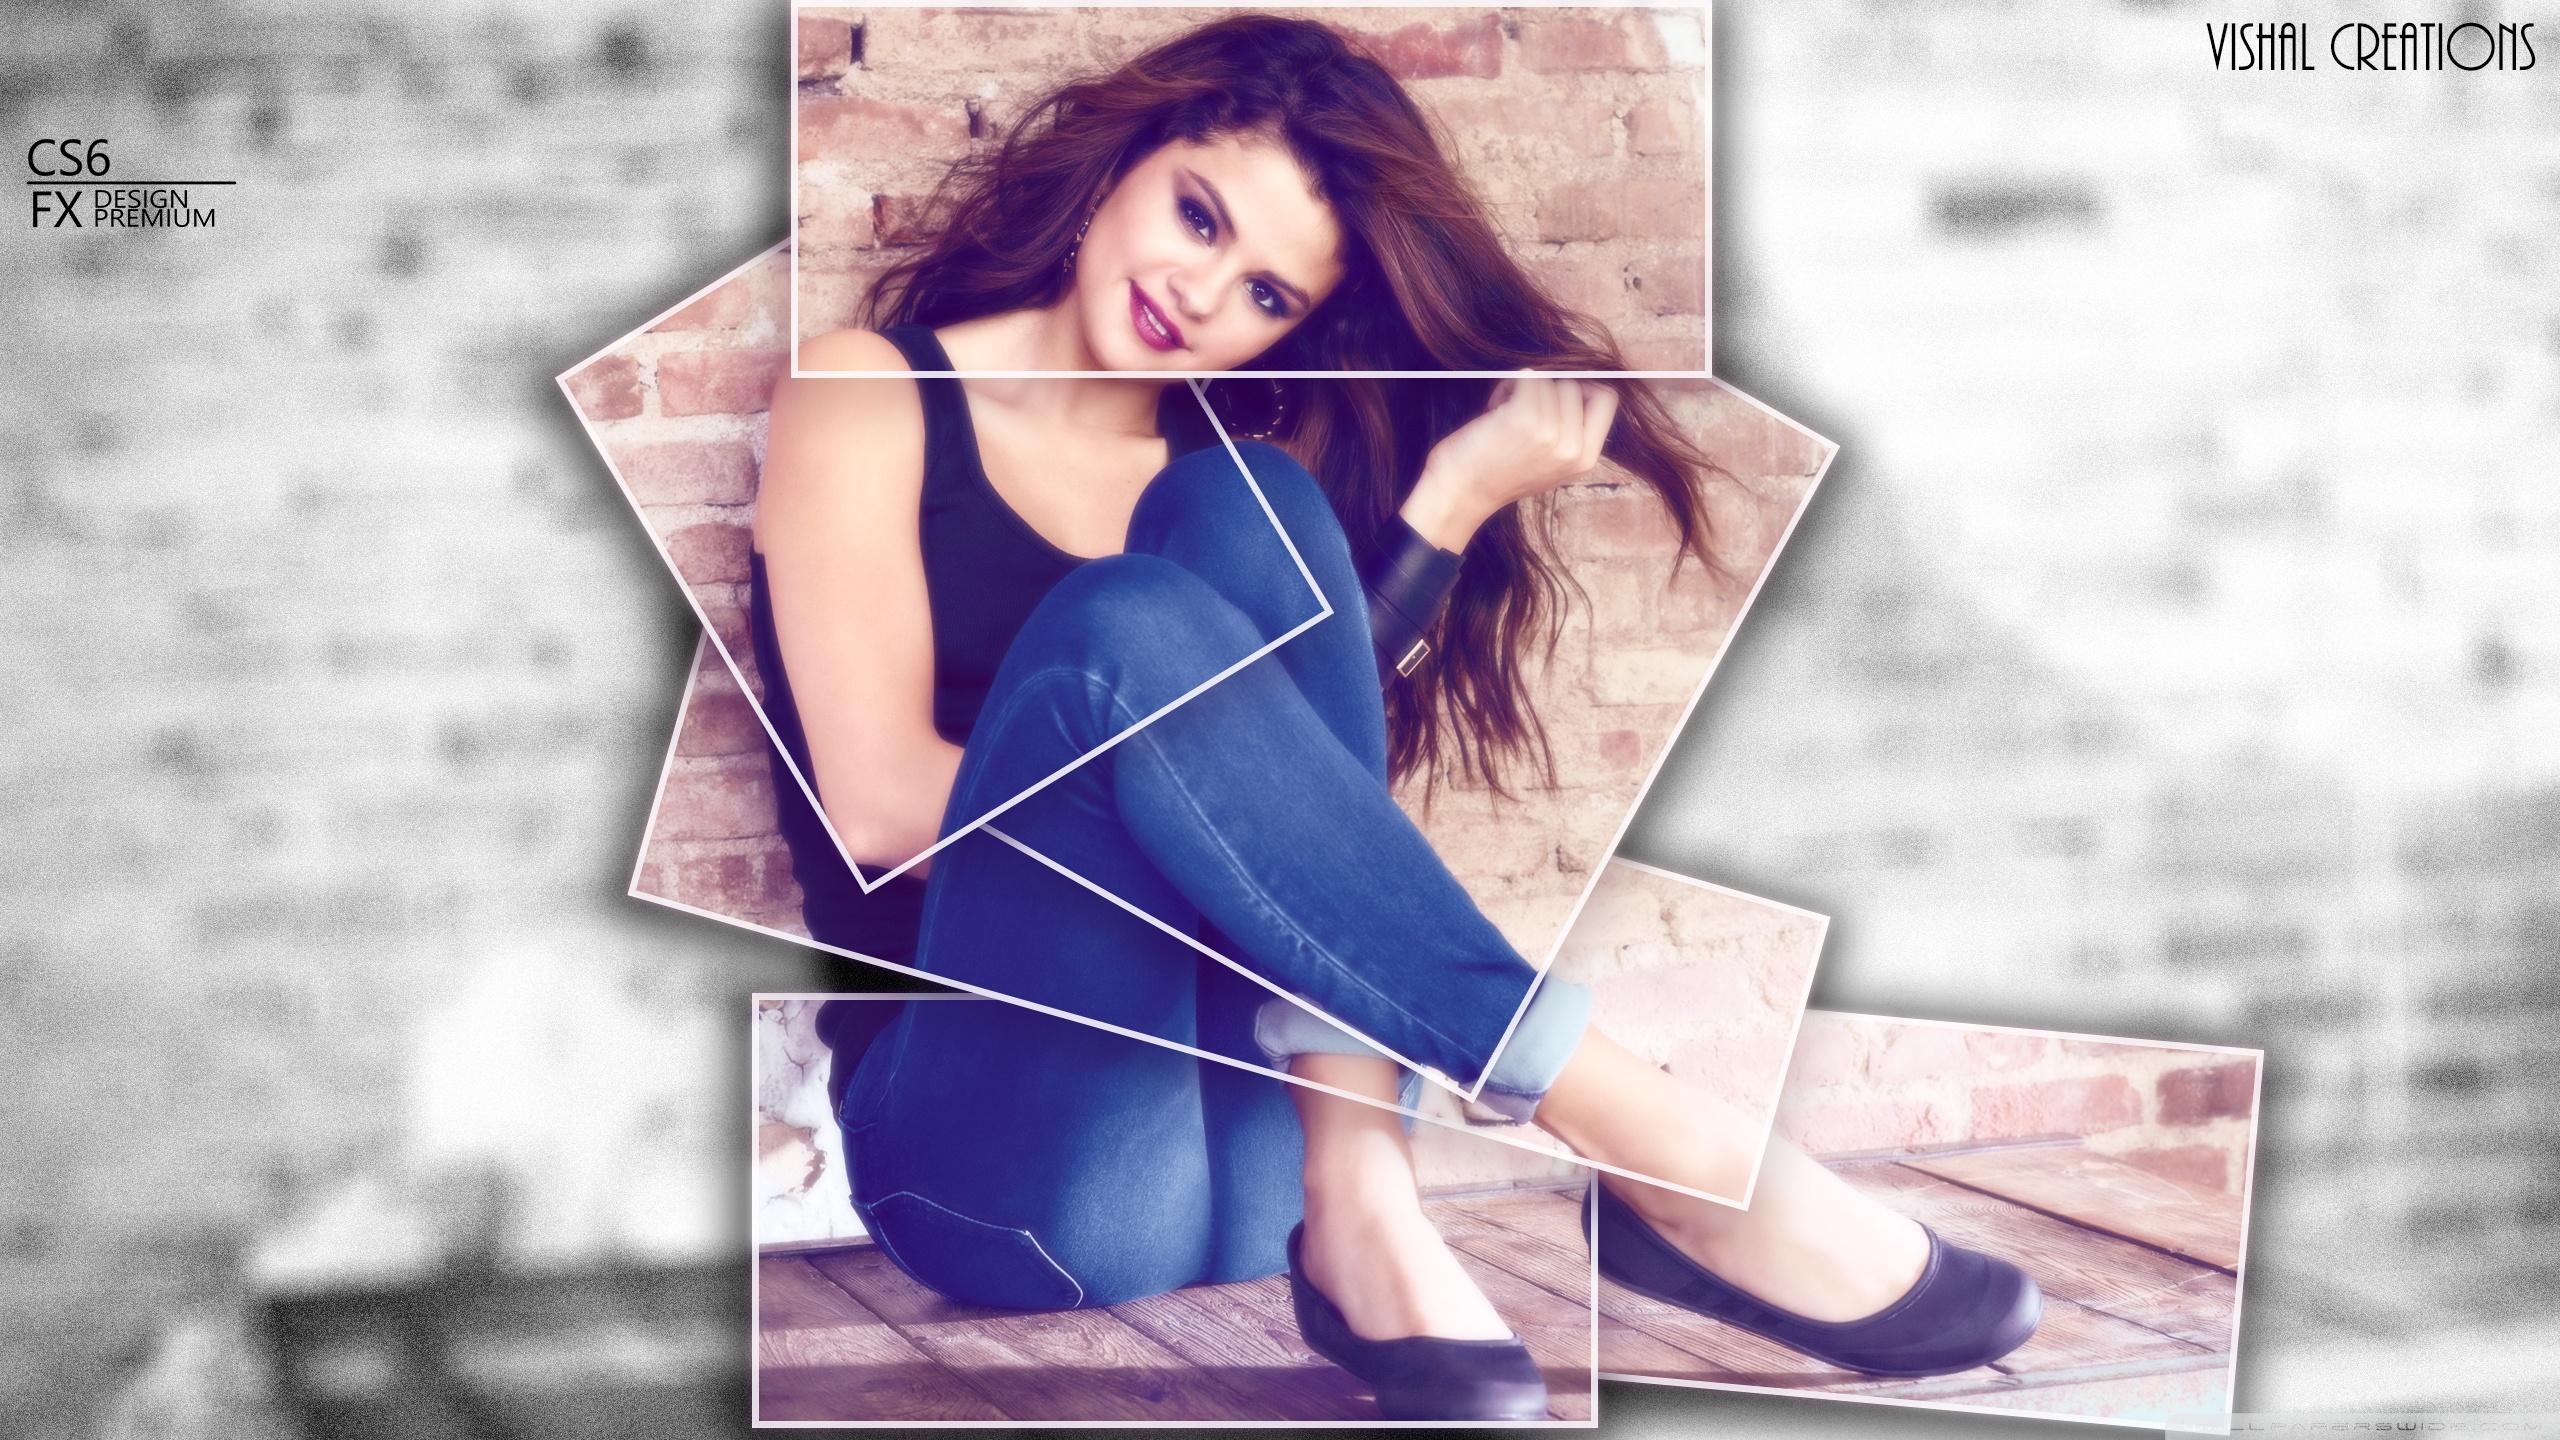 28] Wallpaper Of Selena Gomez on WallpaperSafari 2560x1440